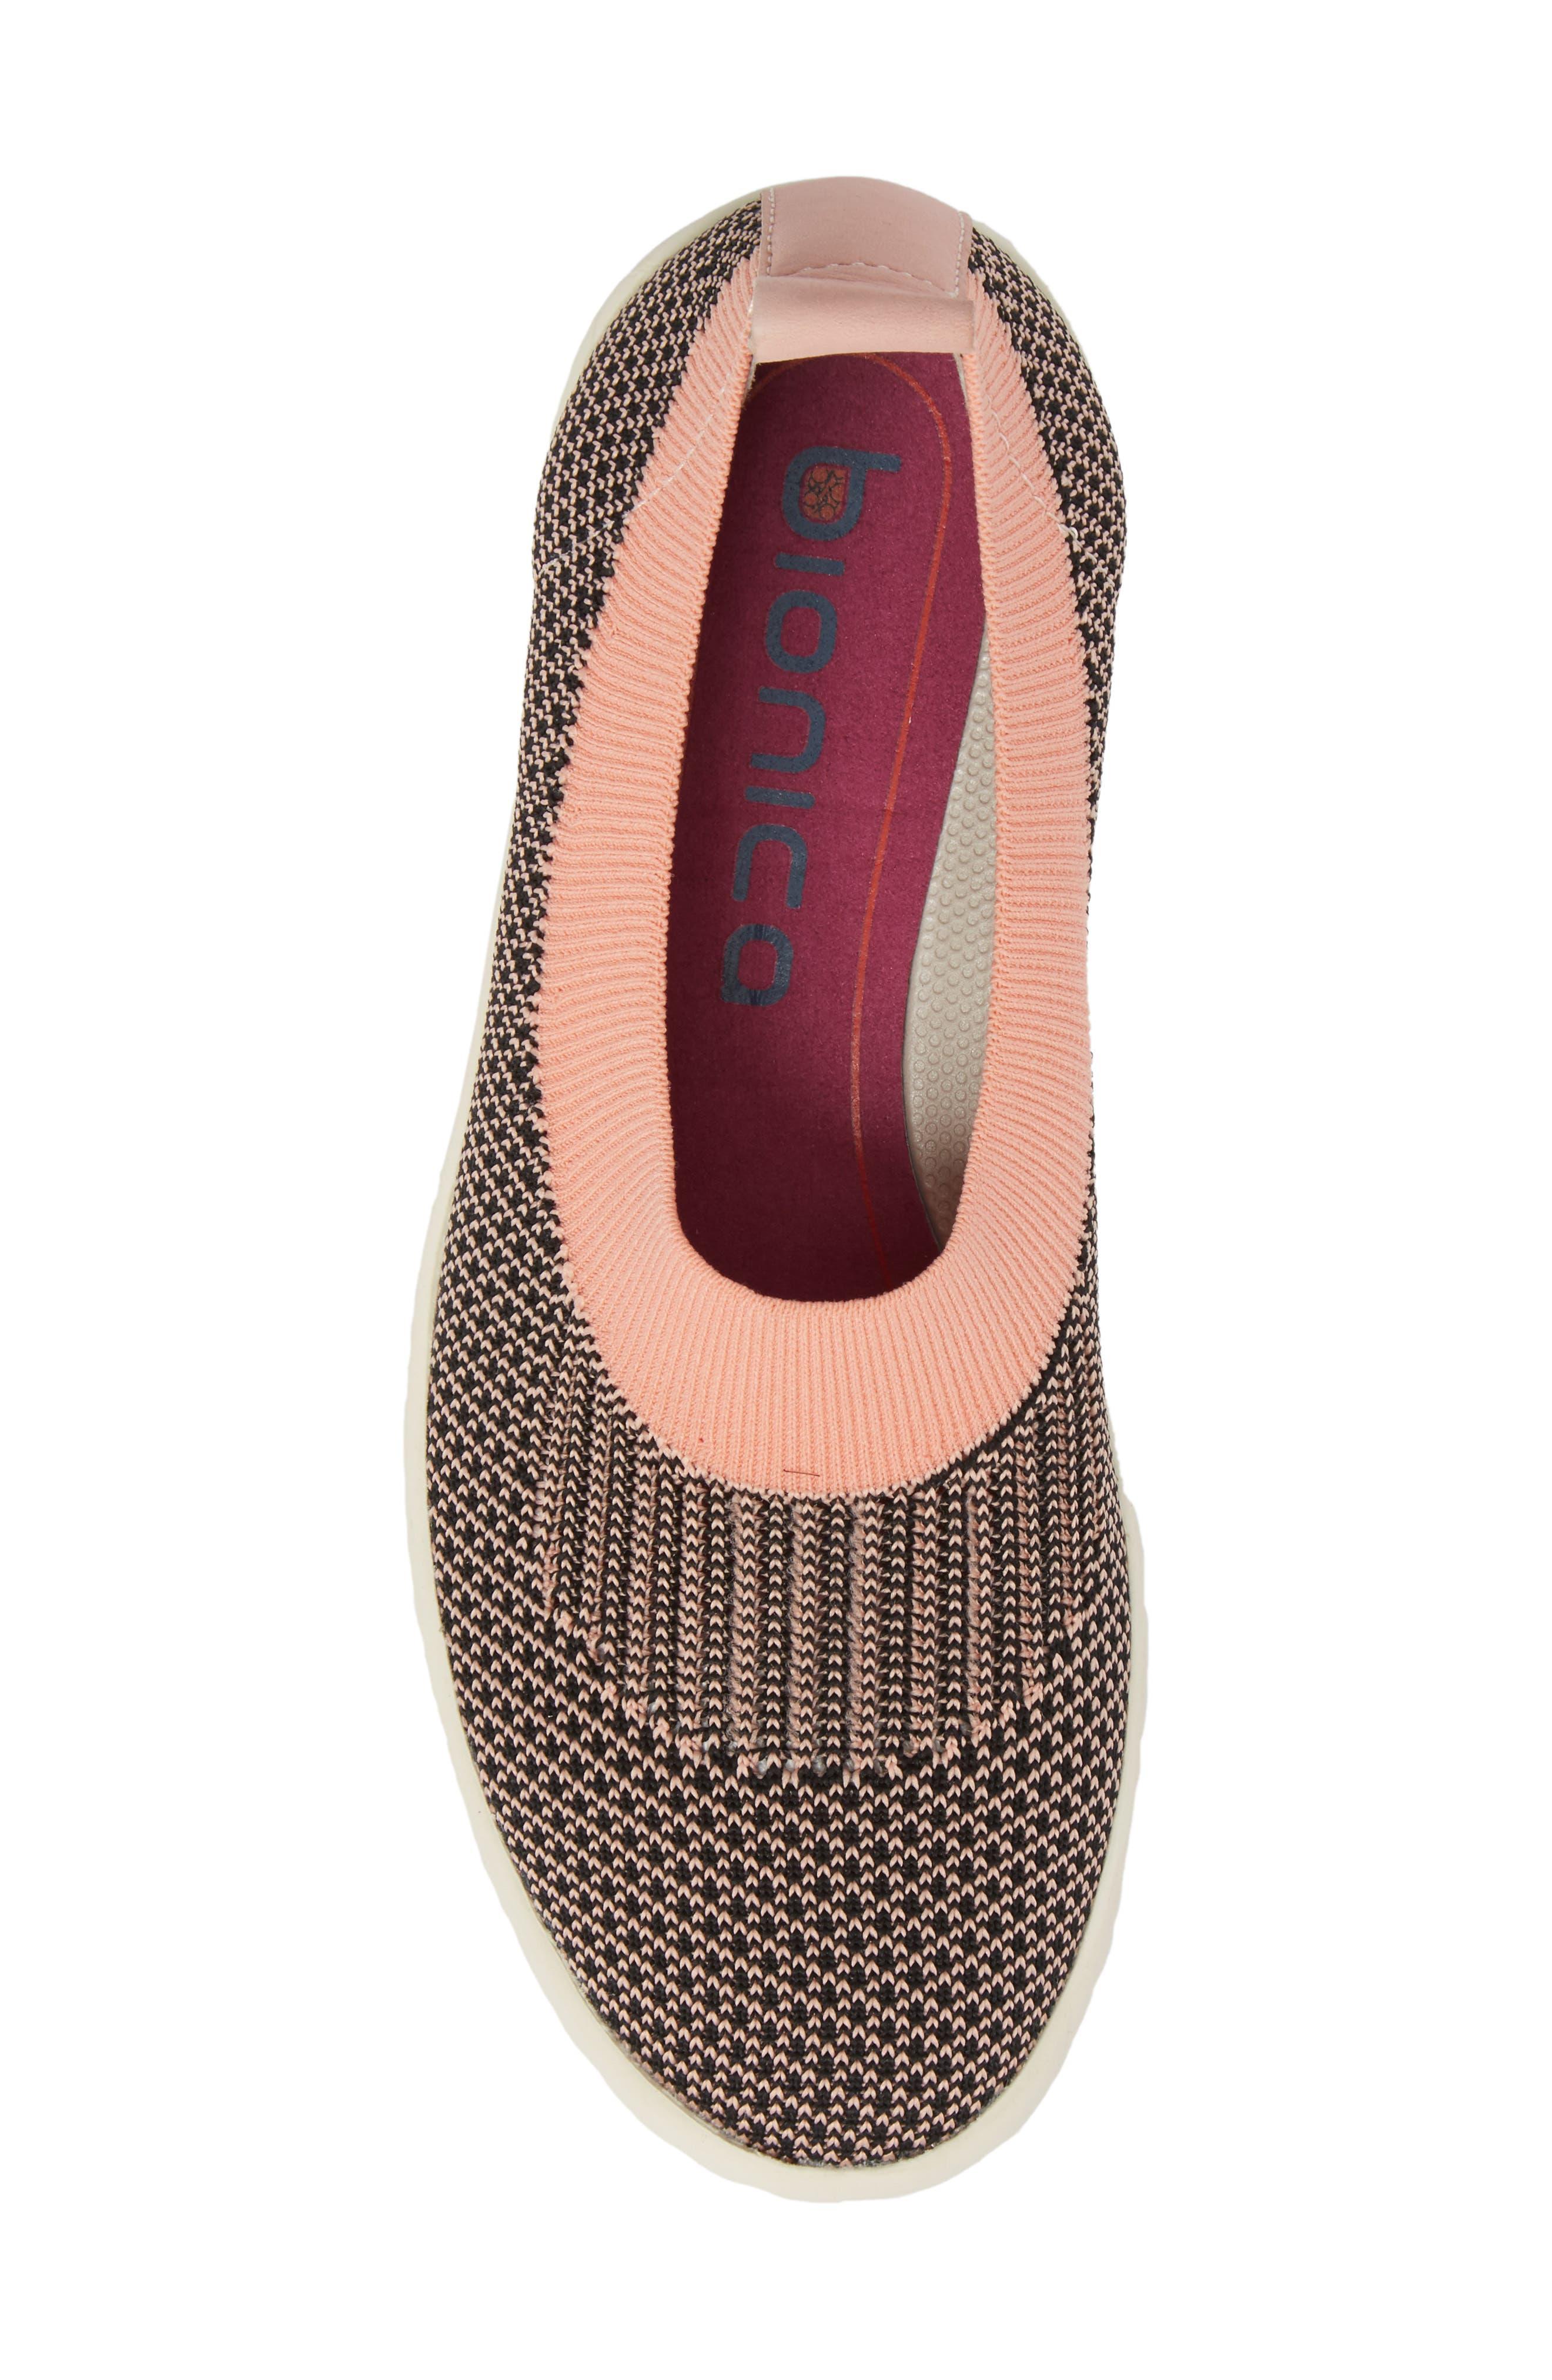 Merigold Slip-On Sock Fit Sneaker,                             Alternate thumbnail 5, color,                             Pink/ Black Knit Fabric